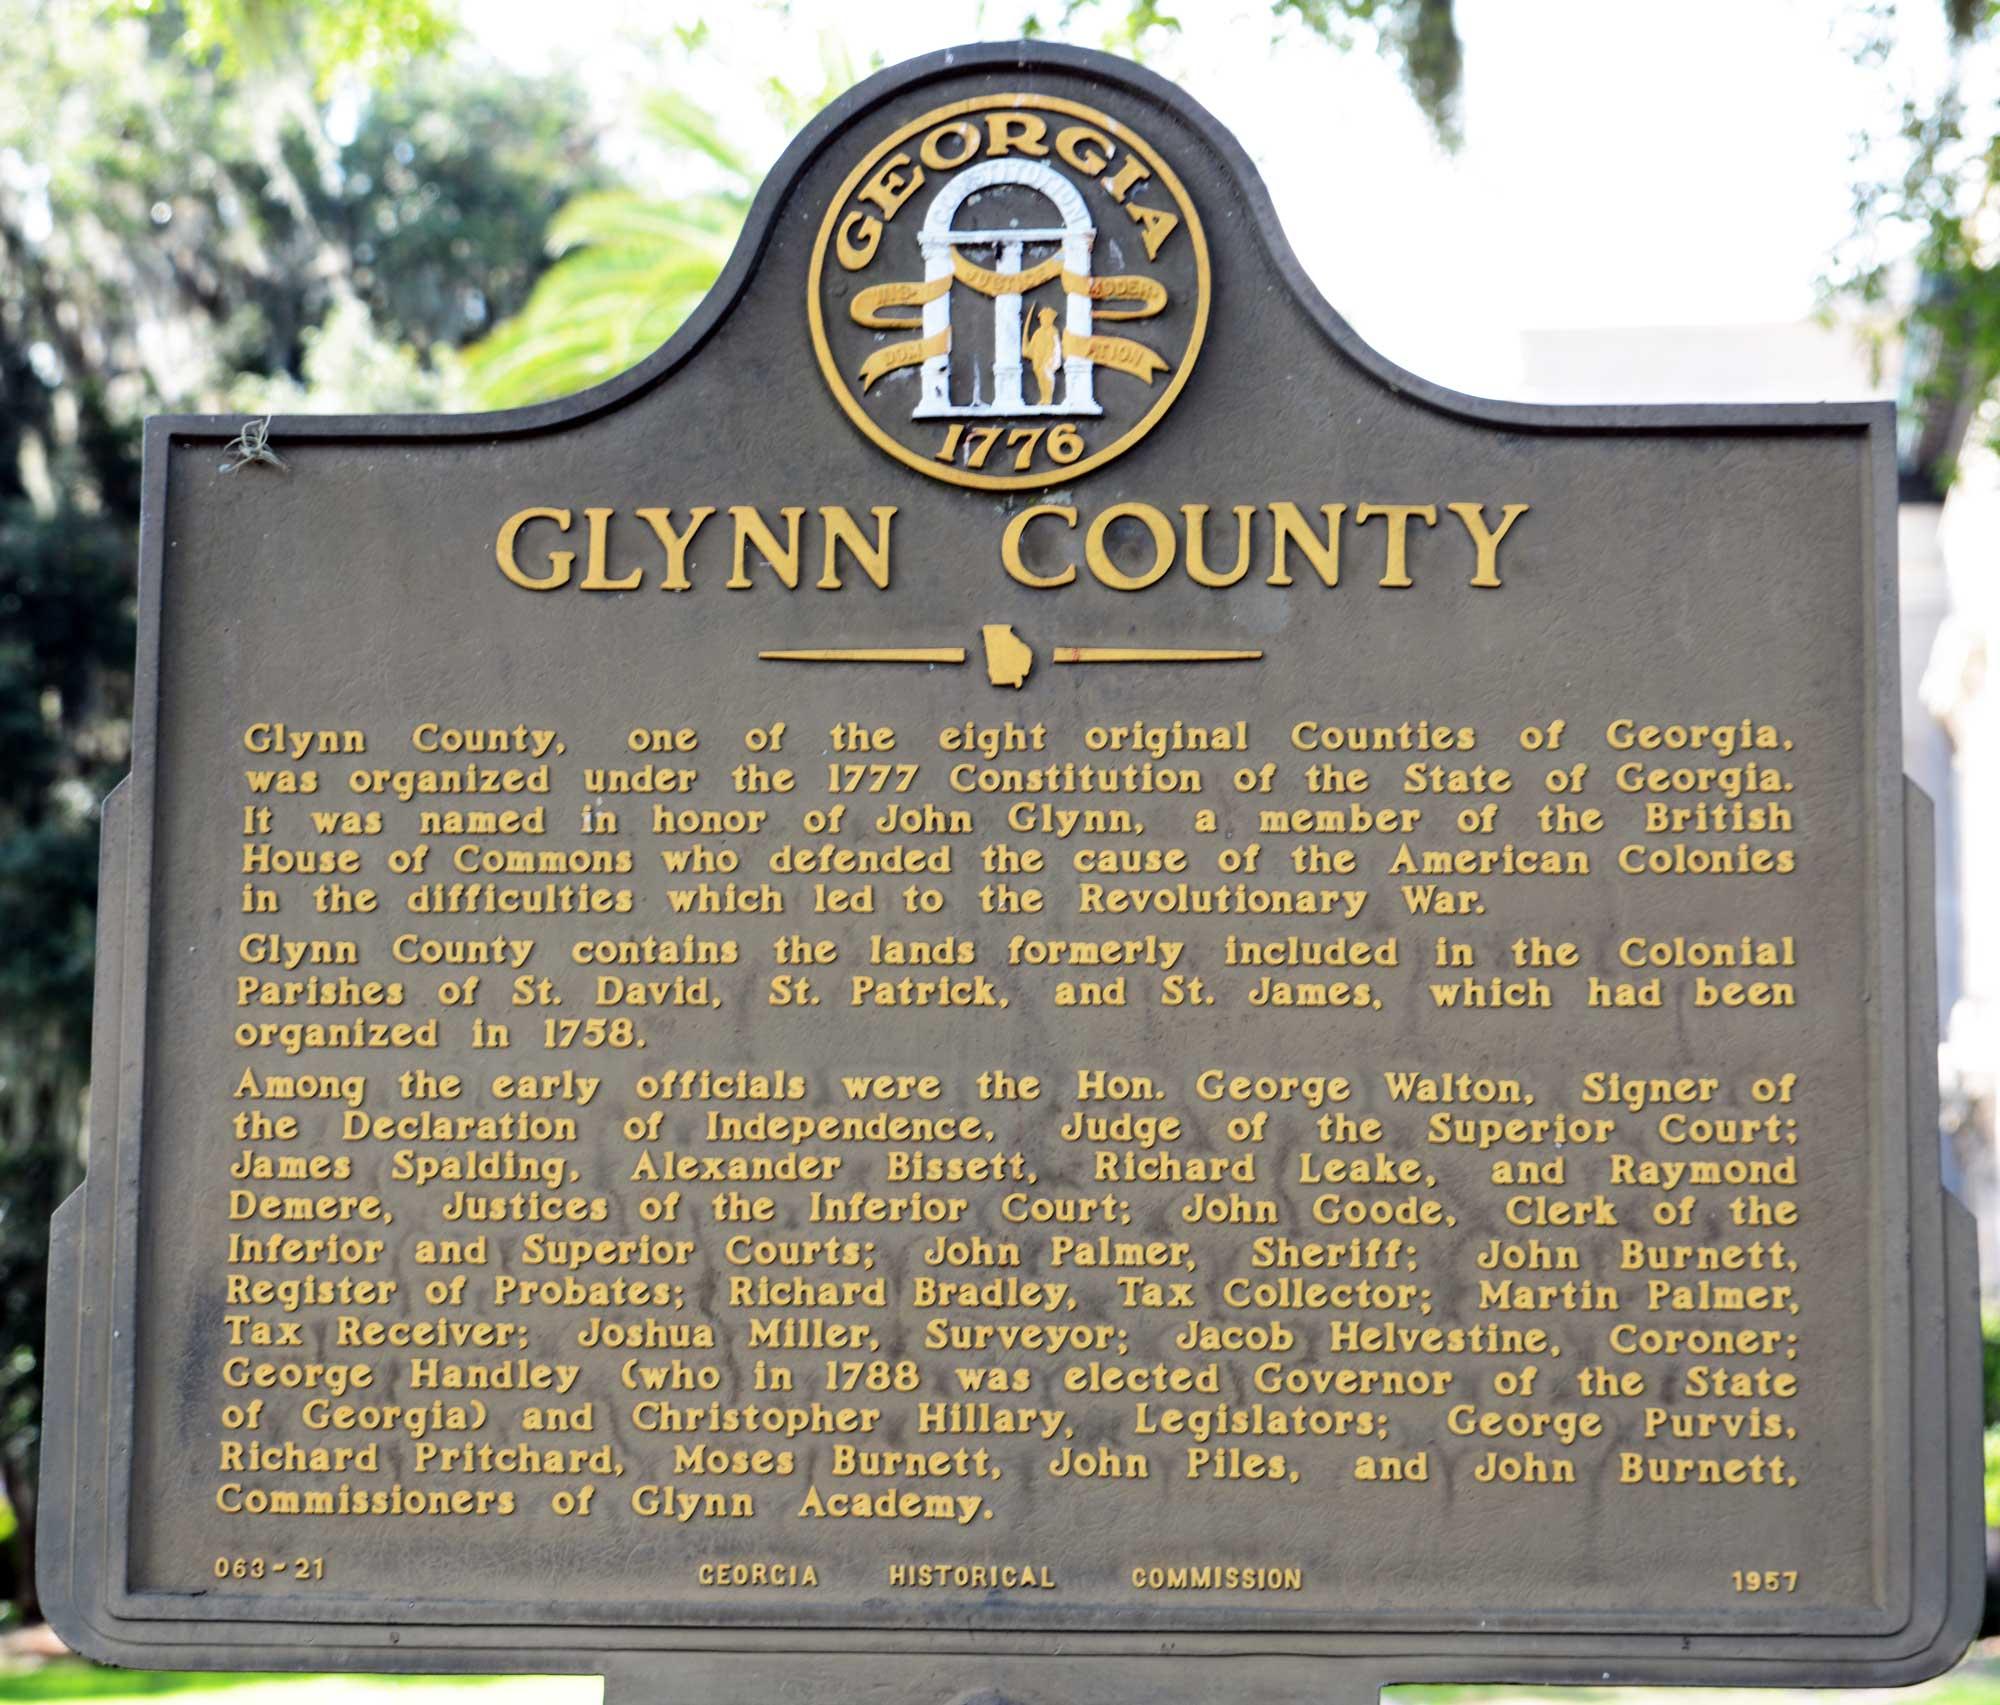 Historical marker in Glynn County Georgia